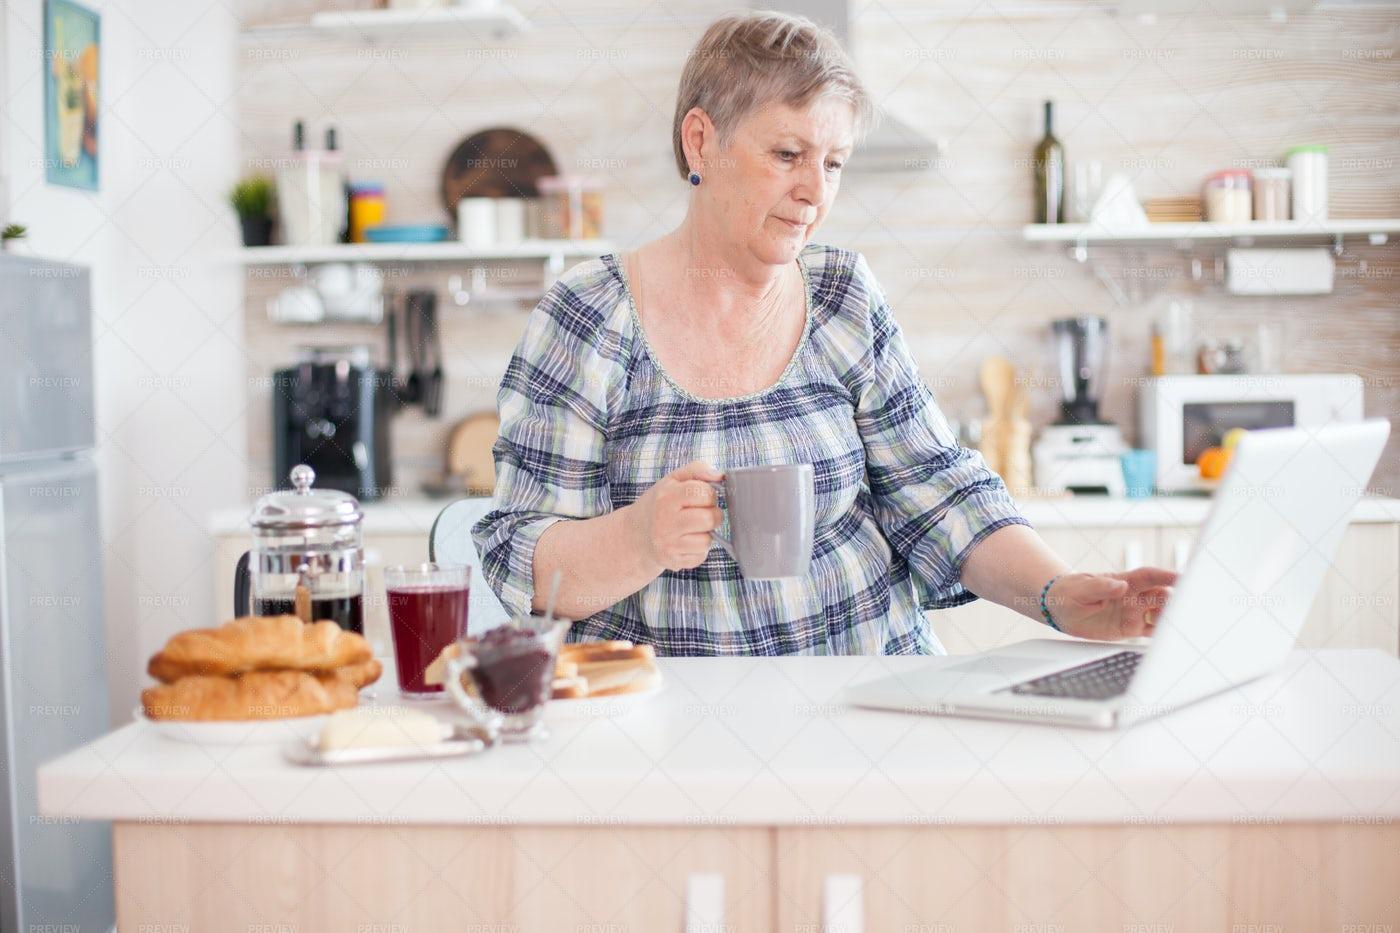 Working In Kitchen: Stock Photos